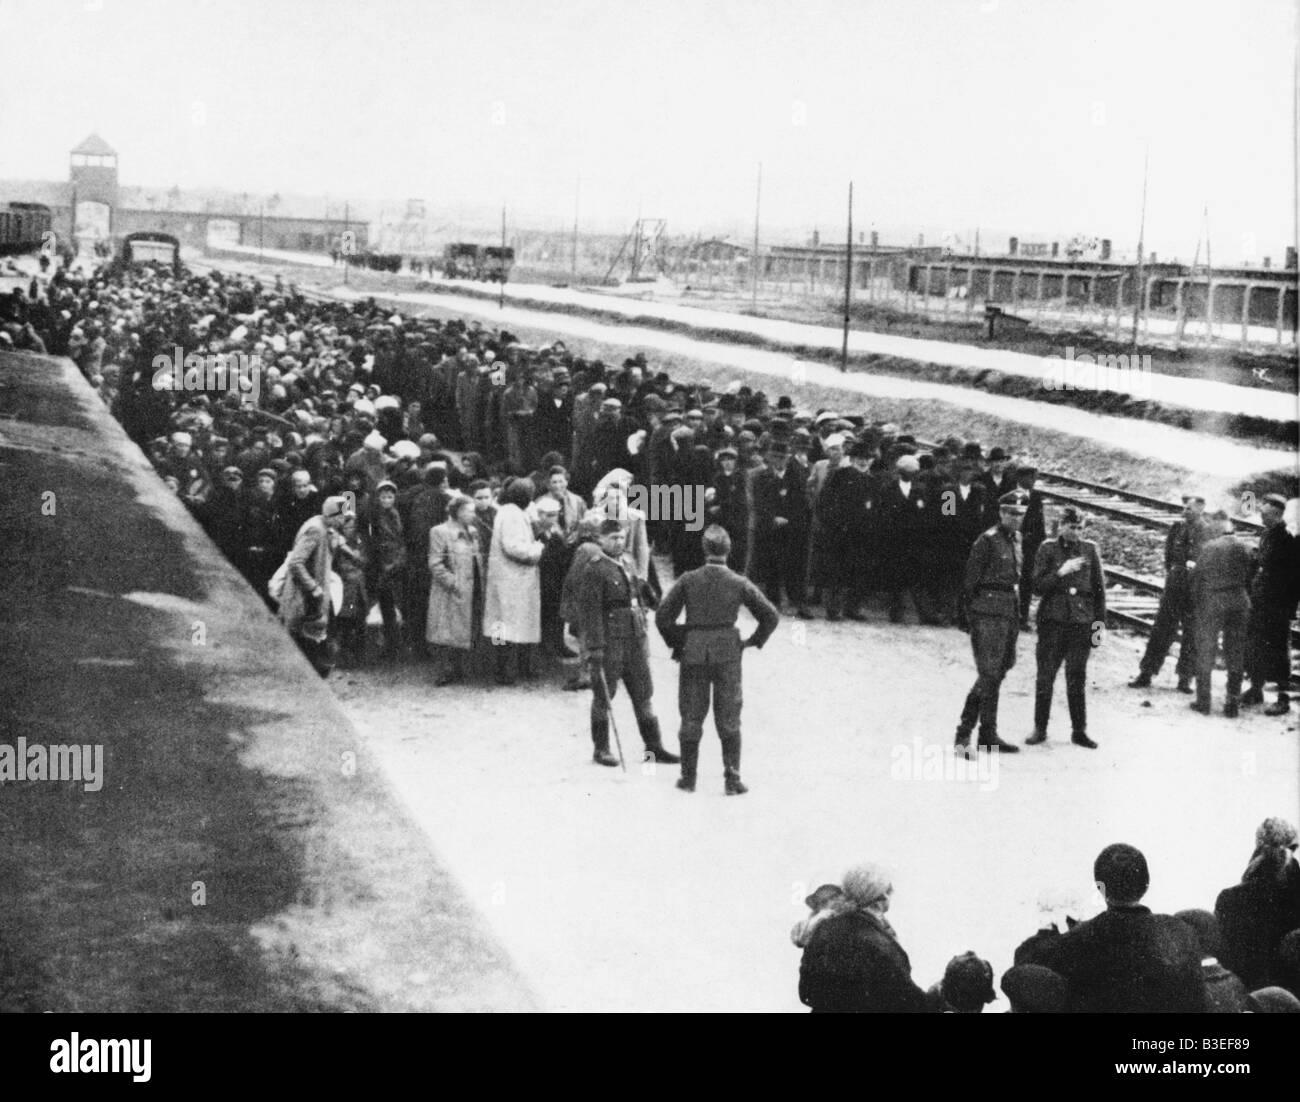 Selection of Jews / Auschwitz / 1944 - Stock Image